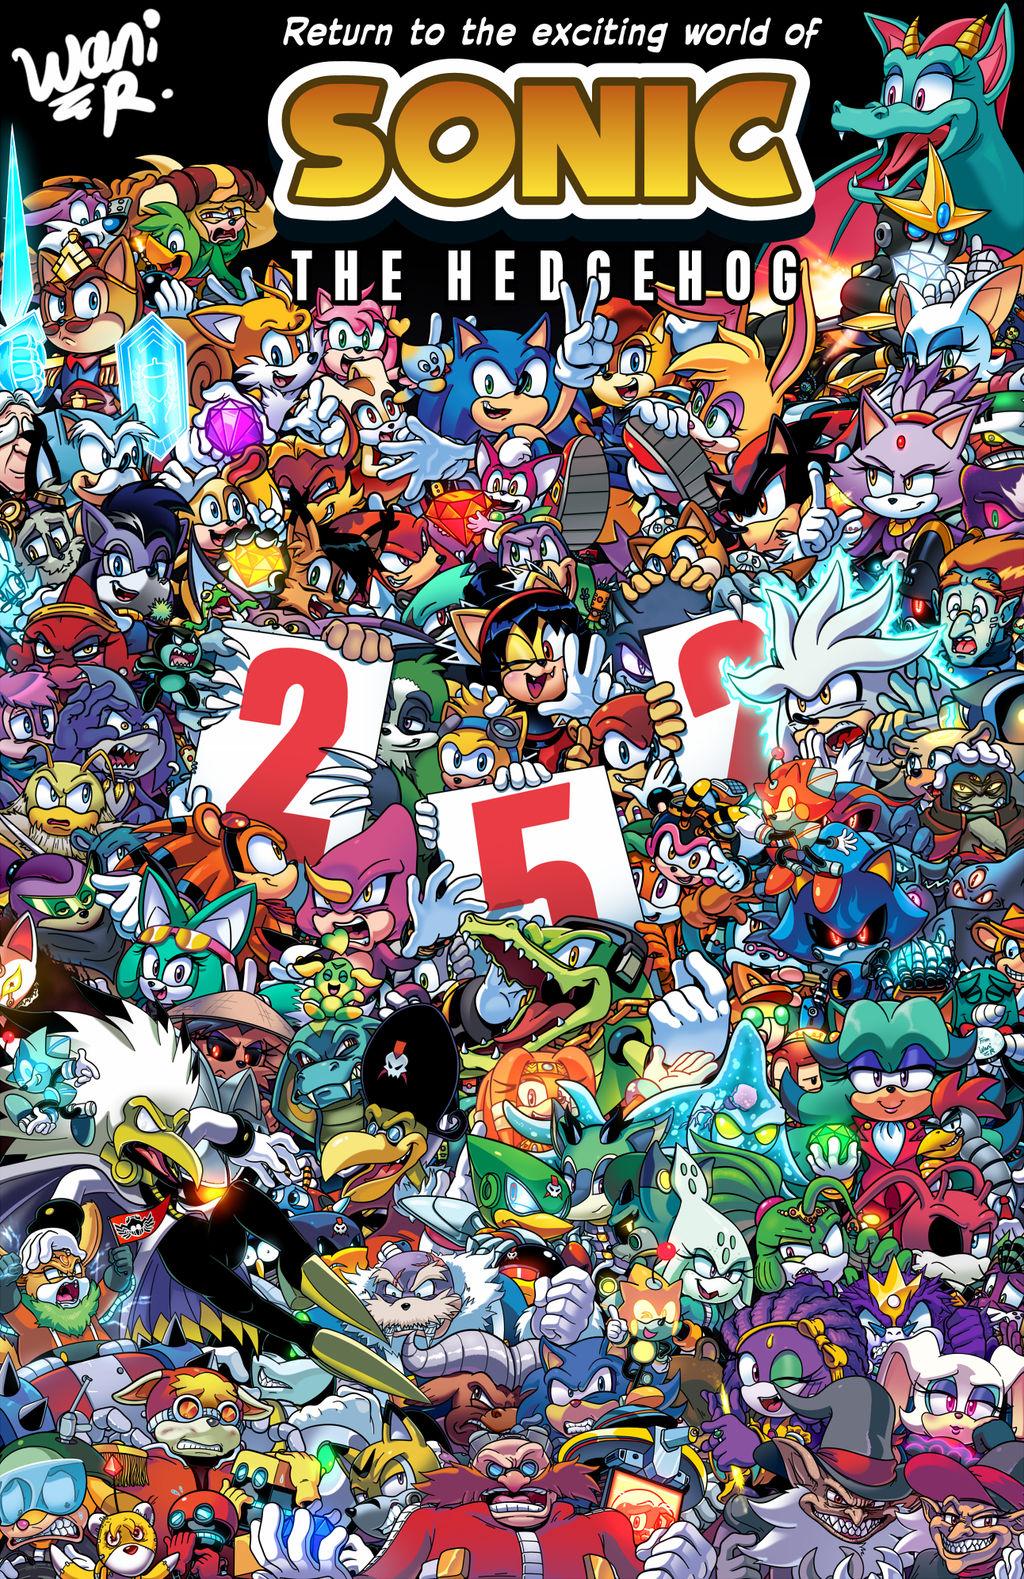 Sonic The Hedgehog Volume 2 Cover By Waniramirez On Deviantart